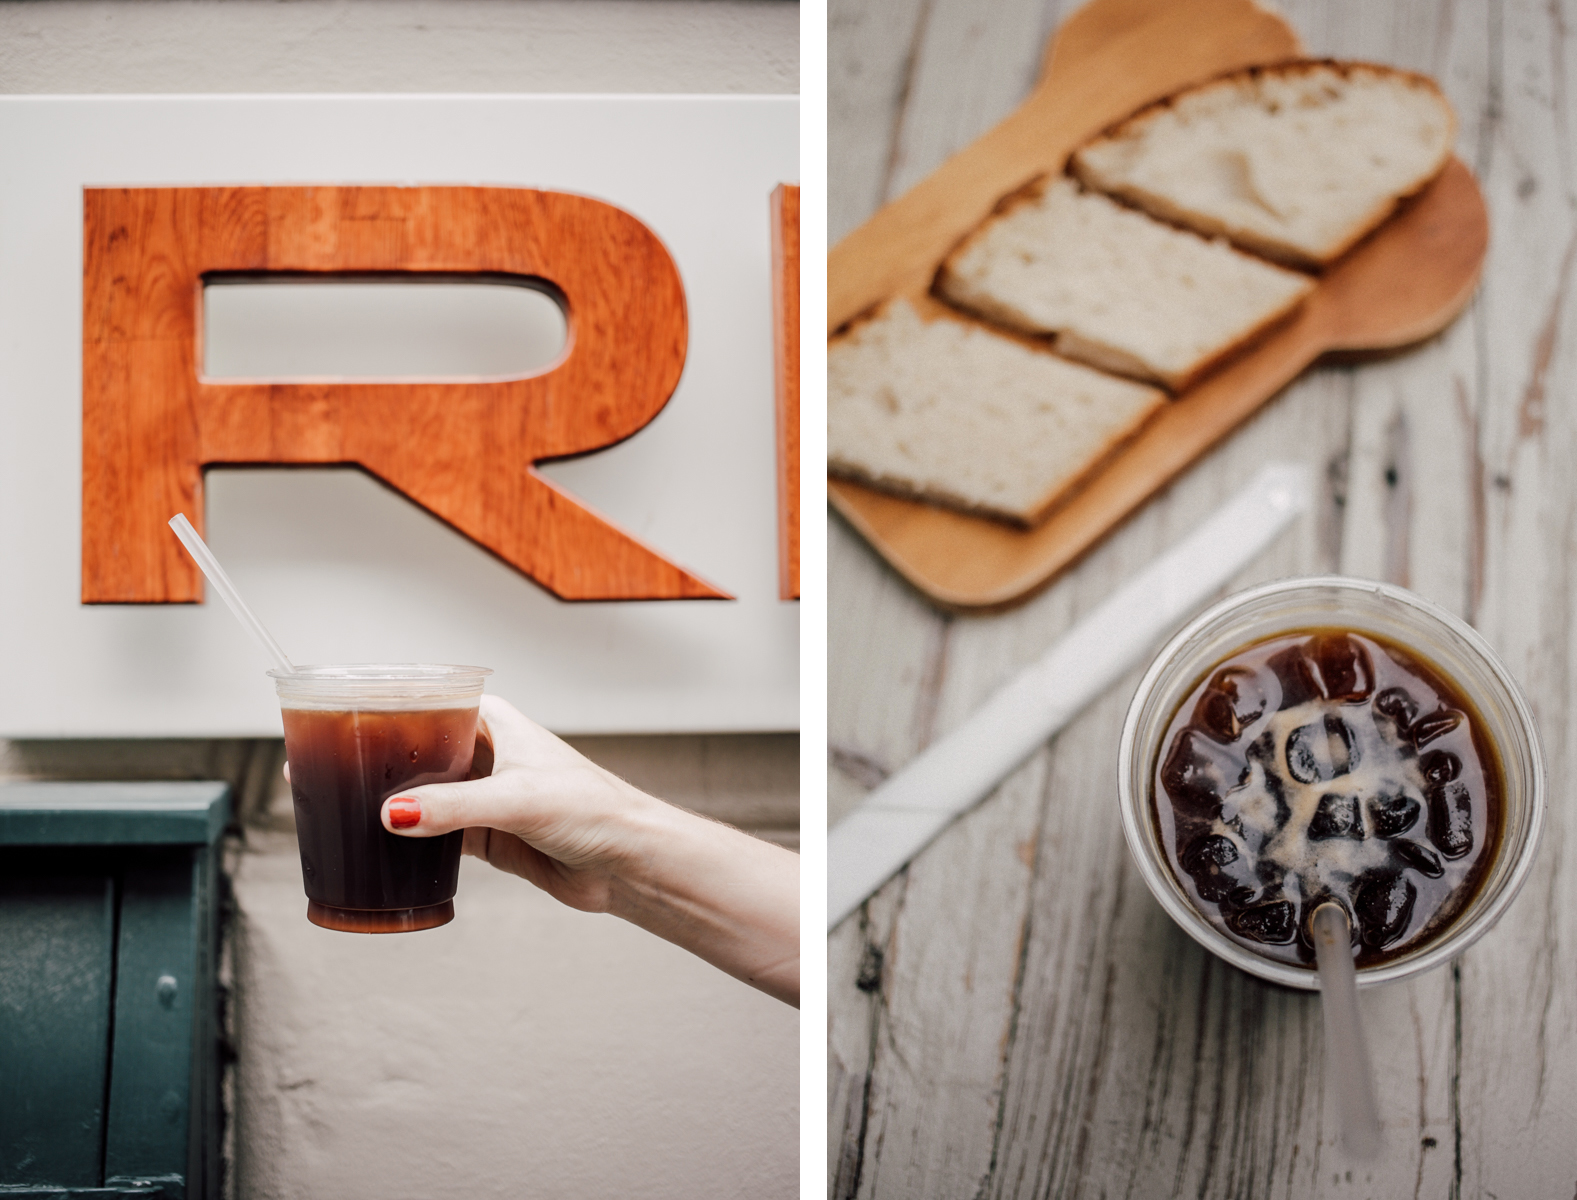 Risteriet Iced Coffee Collage | Scandinavia Standard